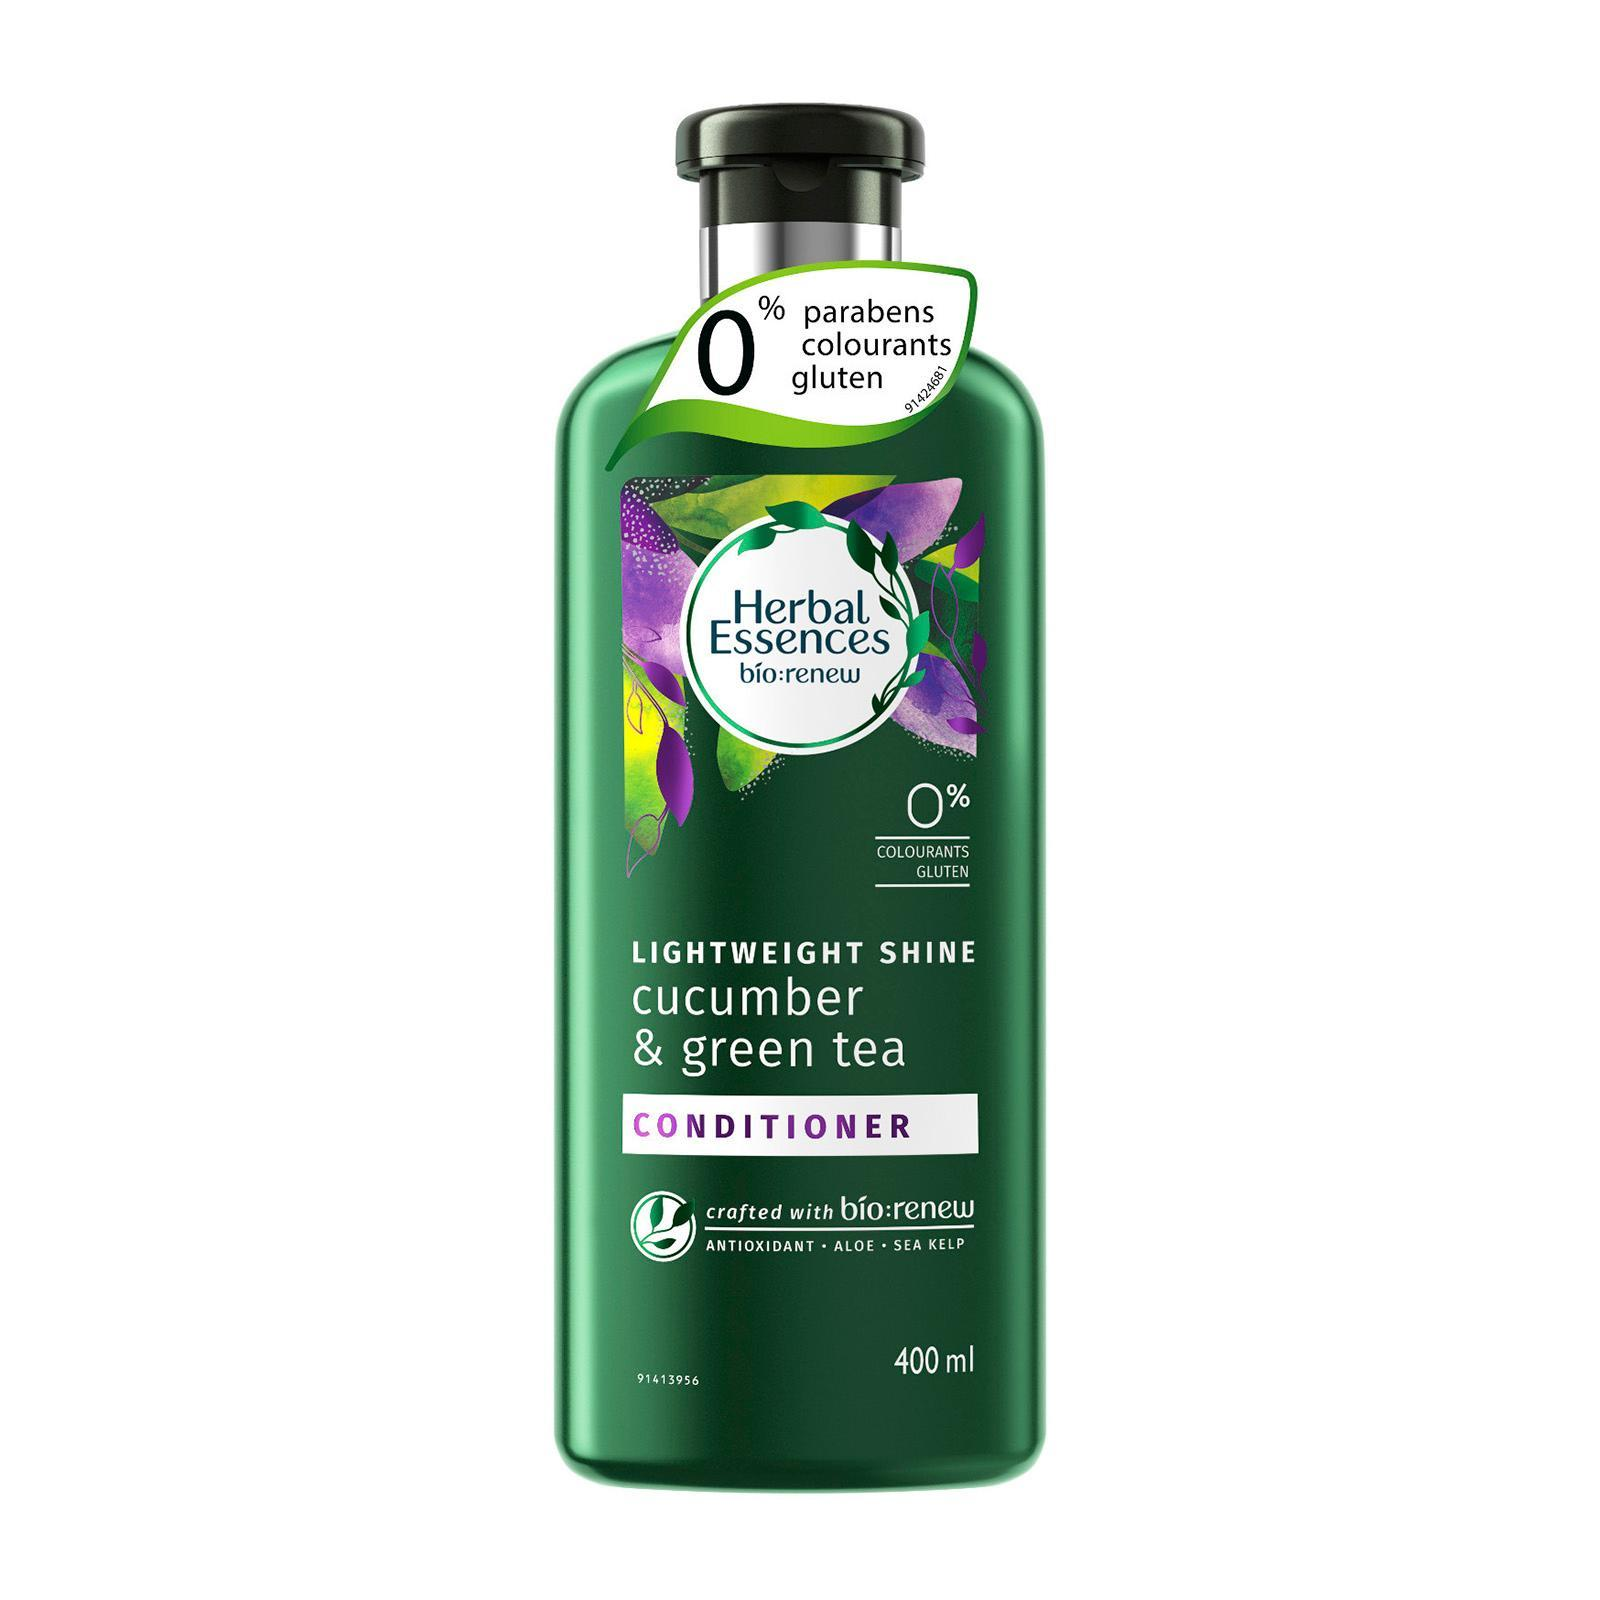 Herbal Essences Bio:Renew Lightweight Shine Cucumber and Green Tea Conditioner